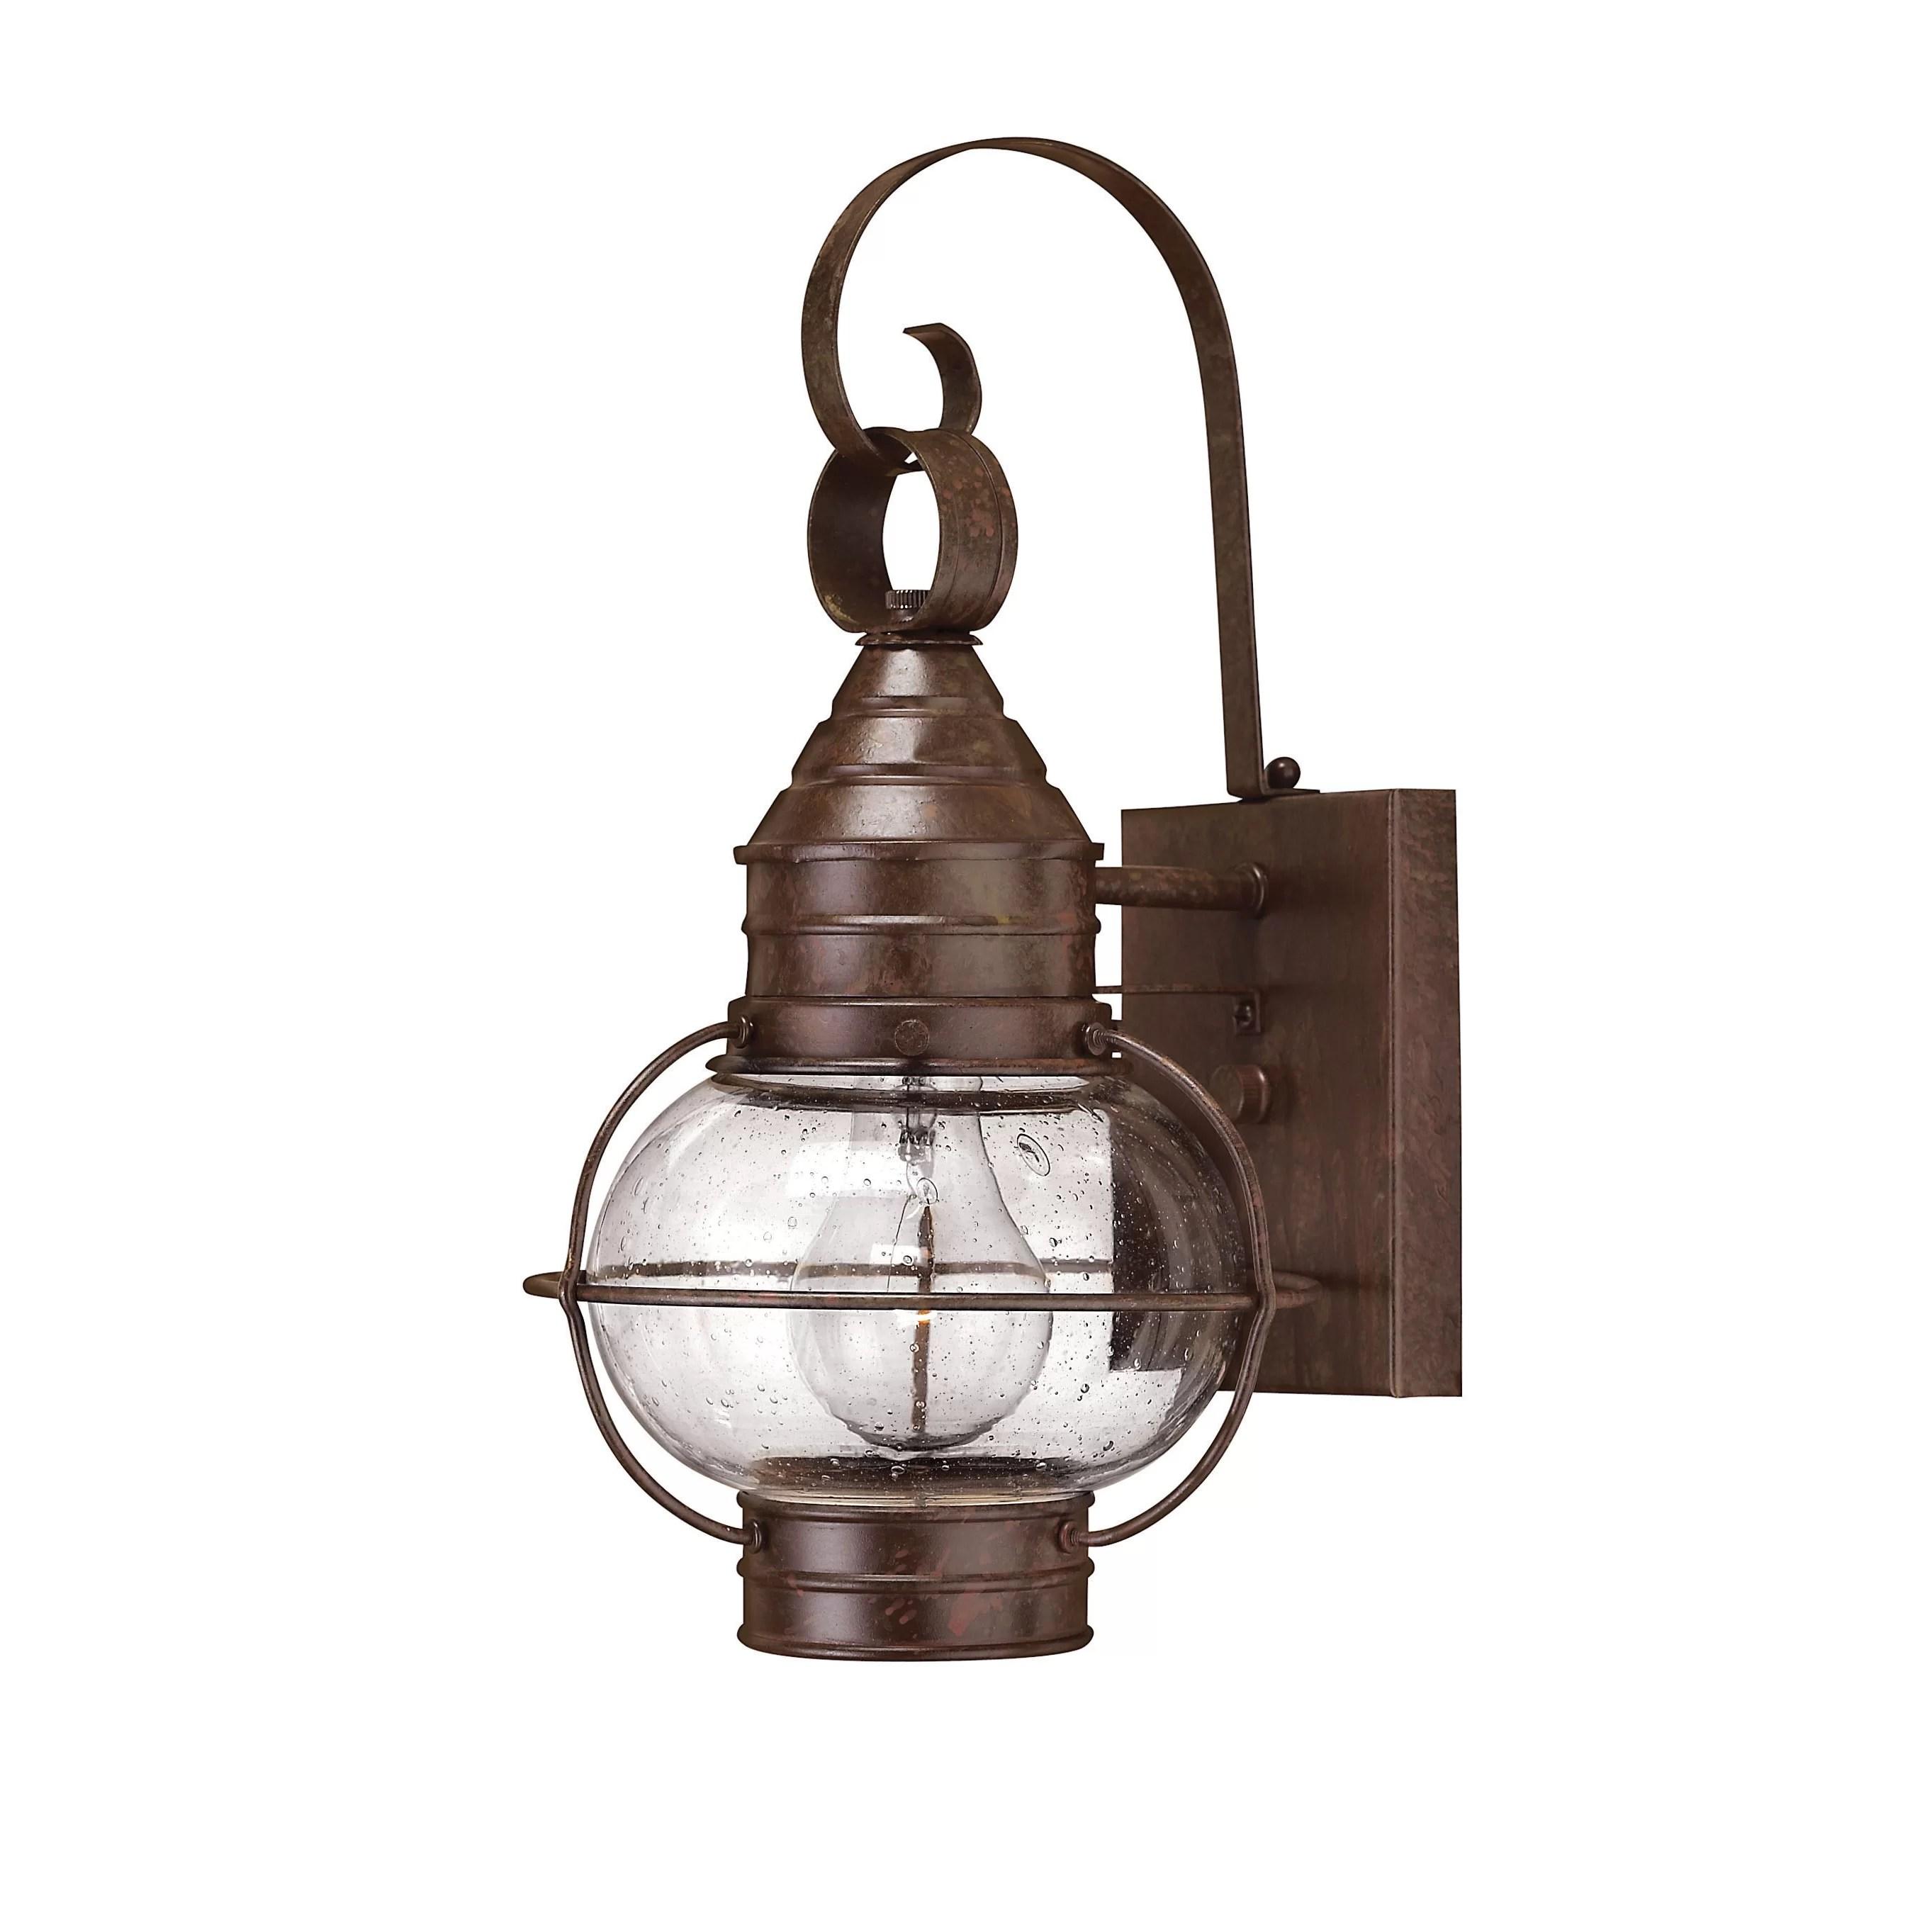 Hinkley Lighting Cape Cod 1 Light Outdoor Wall Lantern